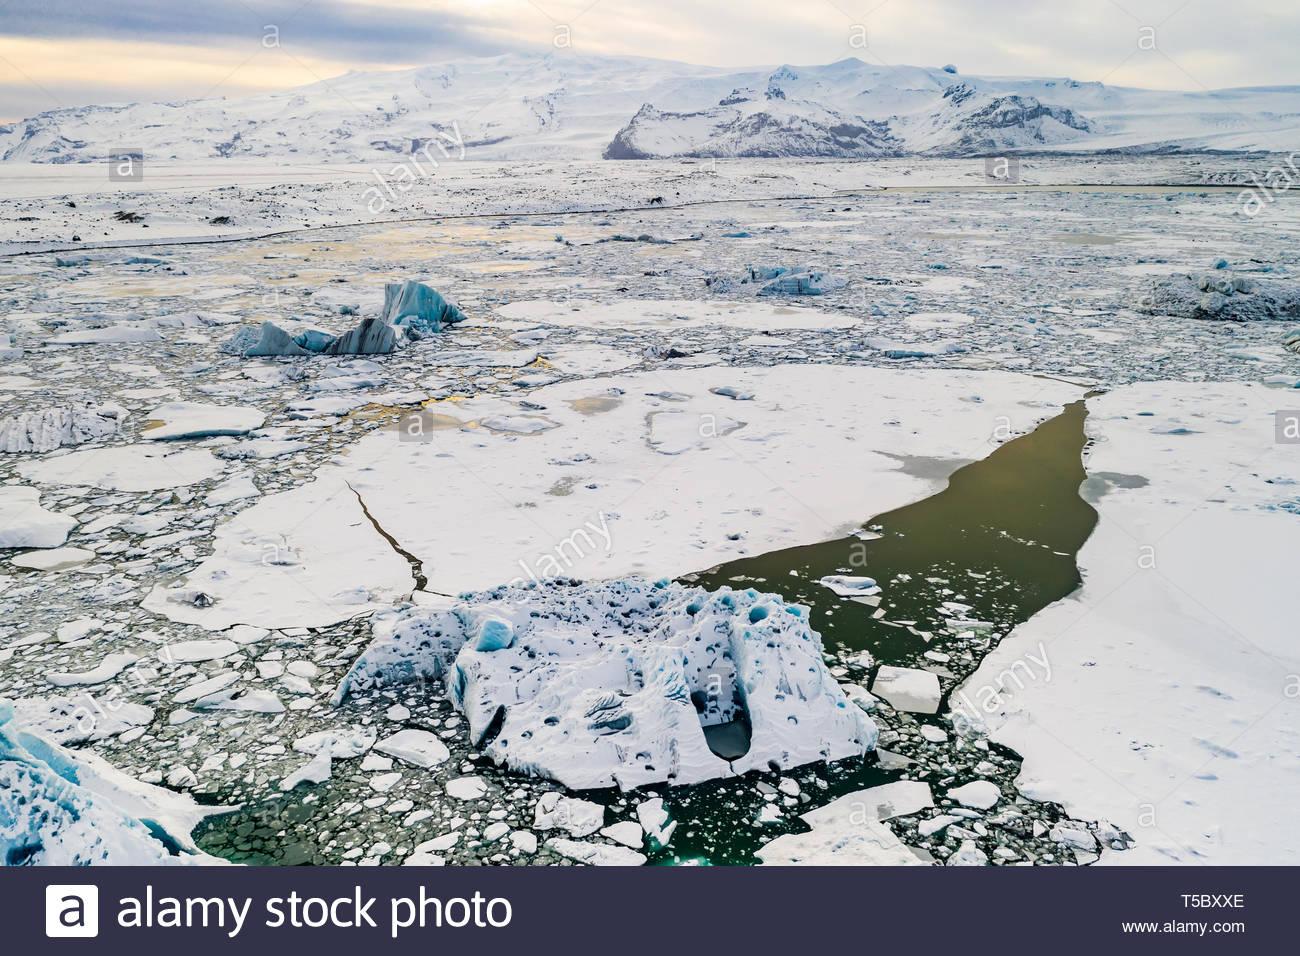 Icebergs in Jokulsarlon glacial lagoon. Vatnajokull National Park, Iceland - Stock Image